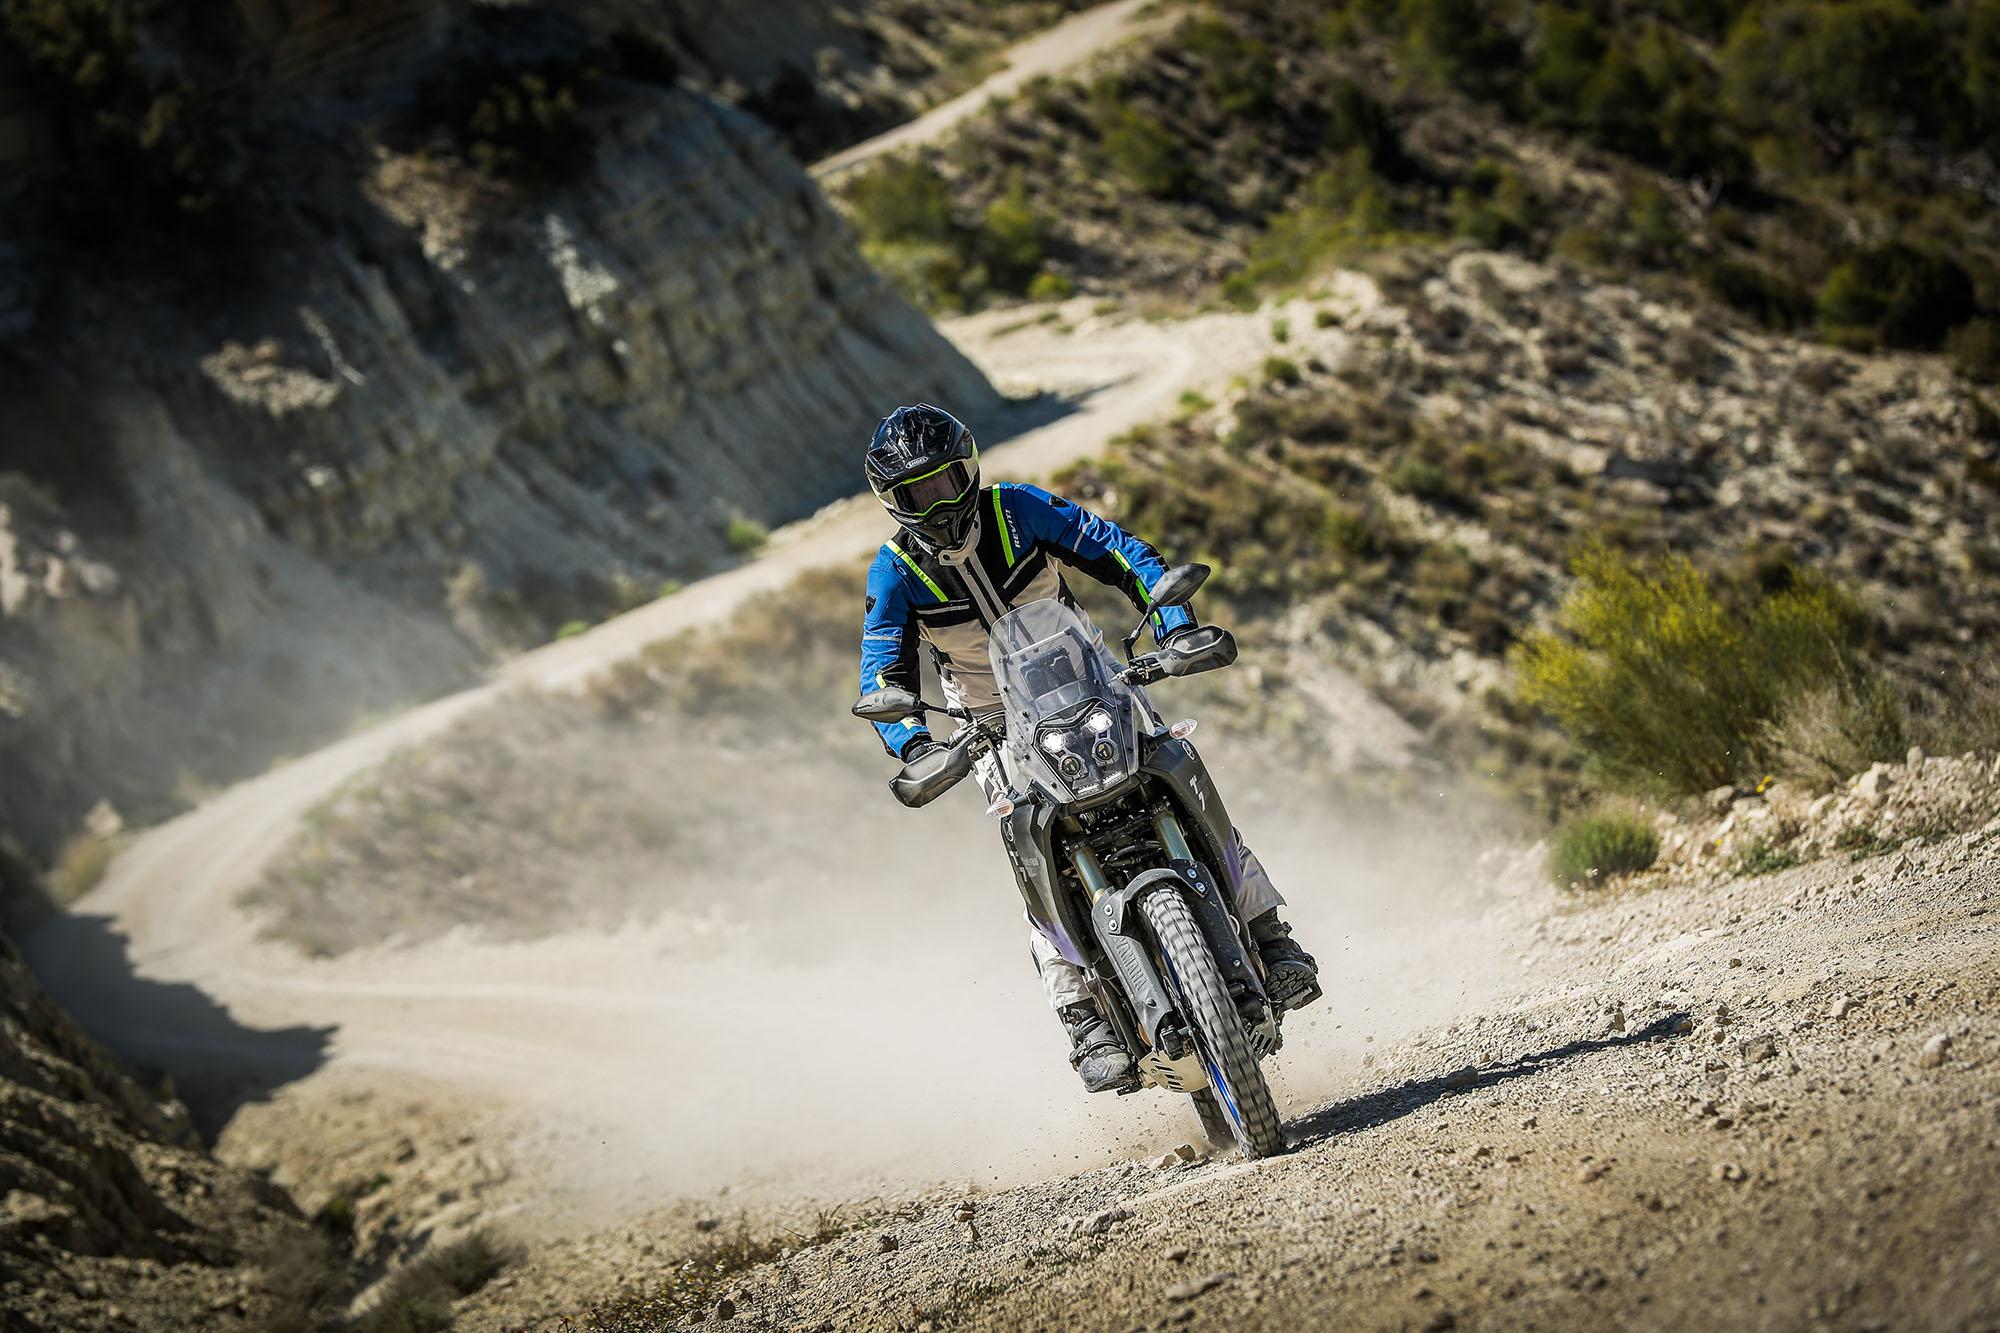 Upshiftfirst Ride 2021 Yamaha T7 T 201 N 201 R 201